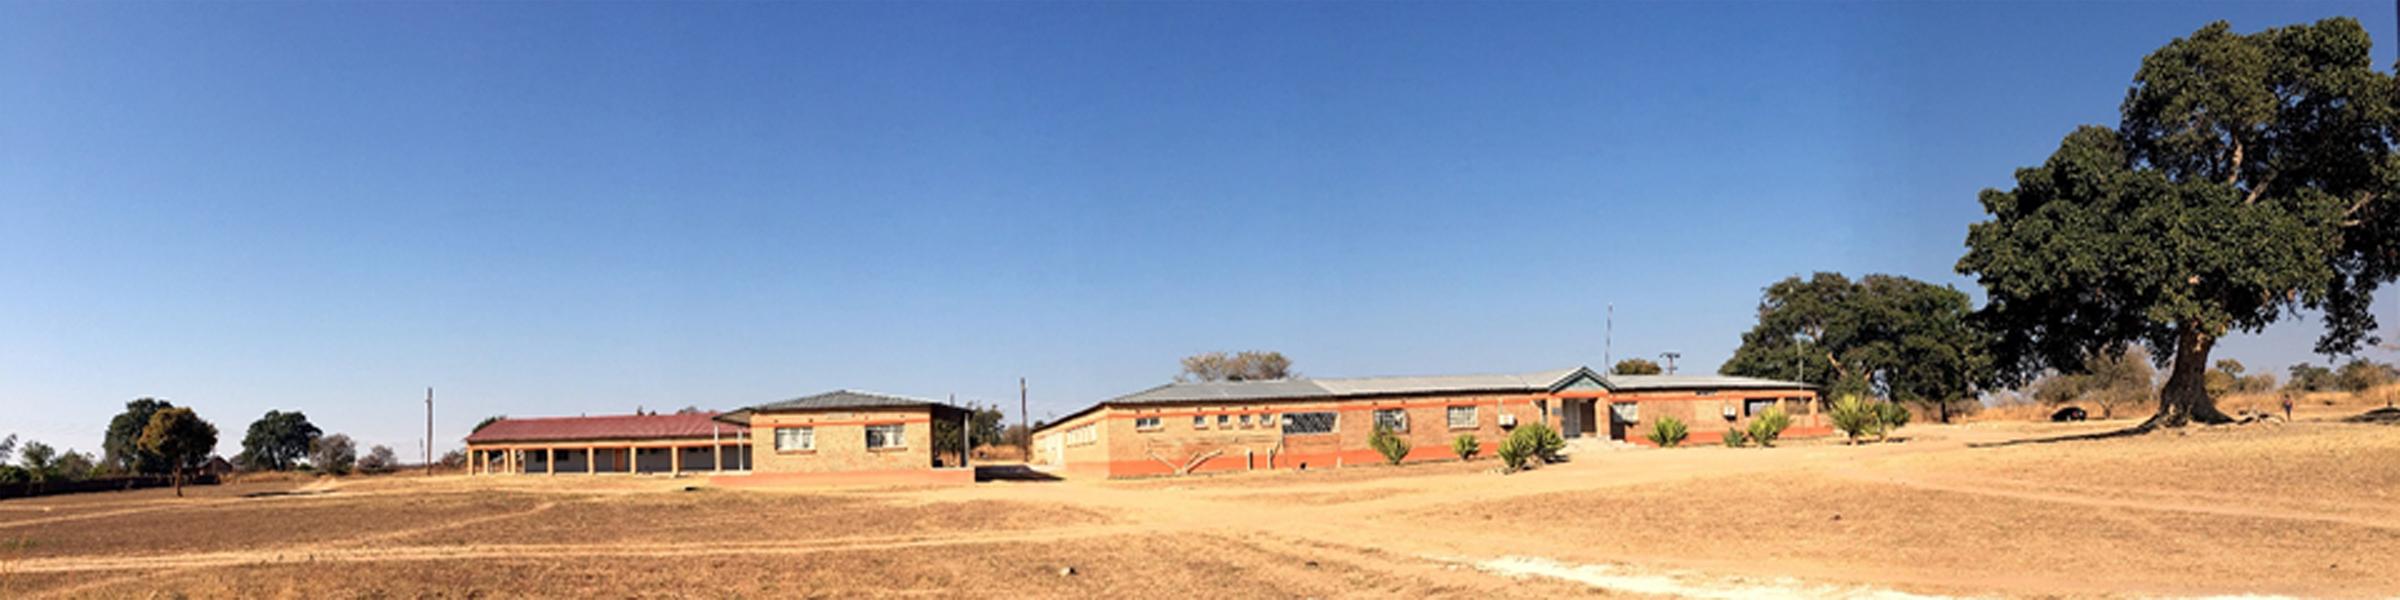 Namwianga Zonal Health Center